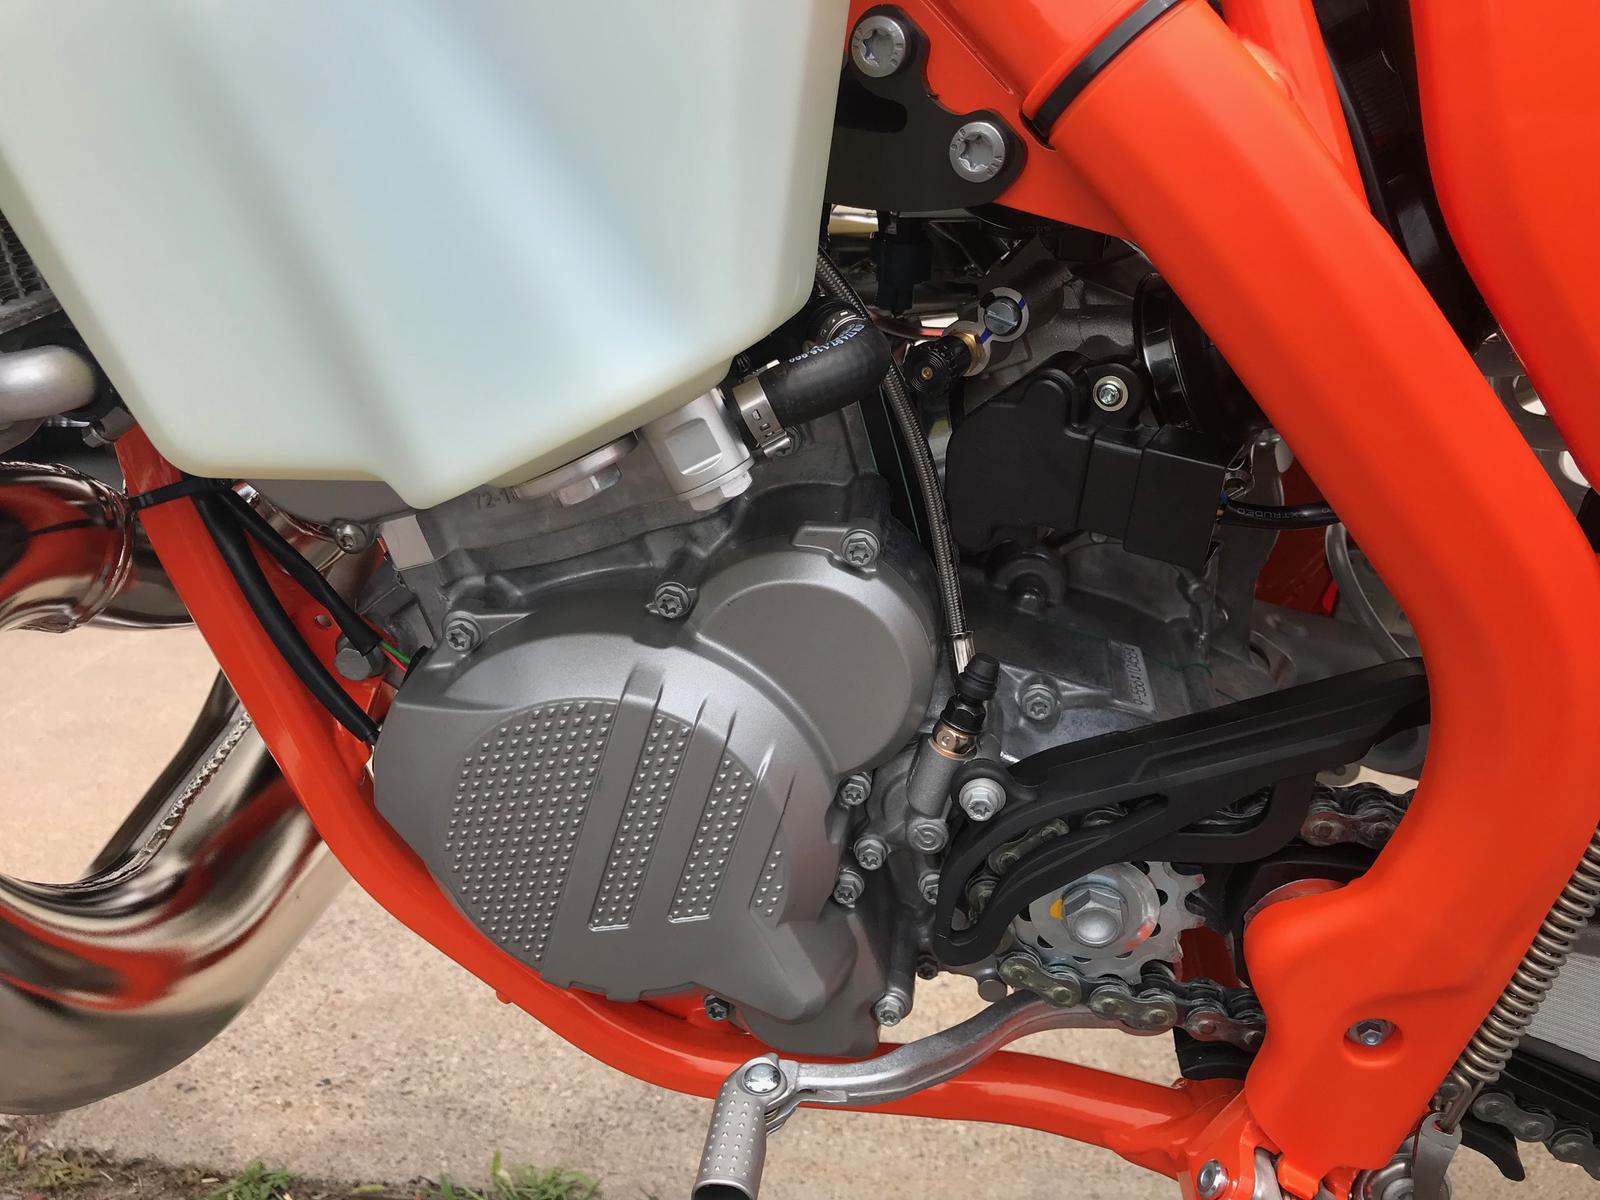 2019 KTM 300 XC-W TPI for sale in Cambridge, MN  Larson's